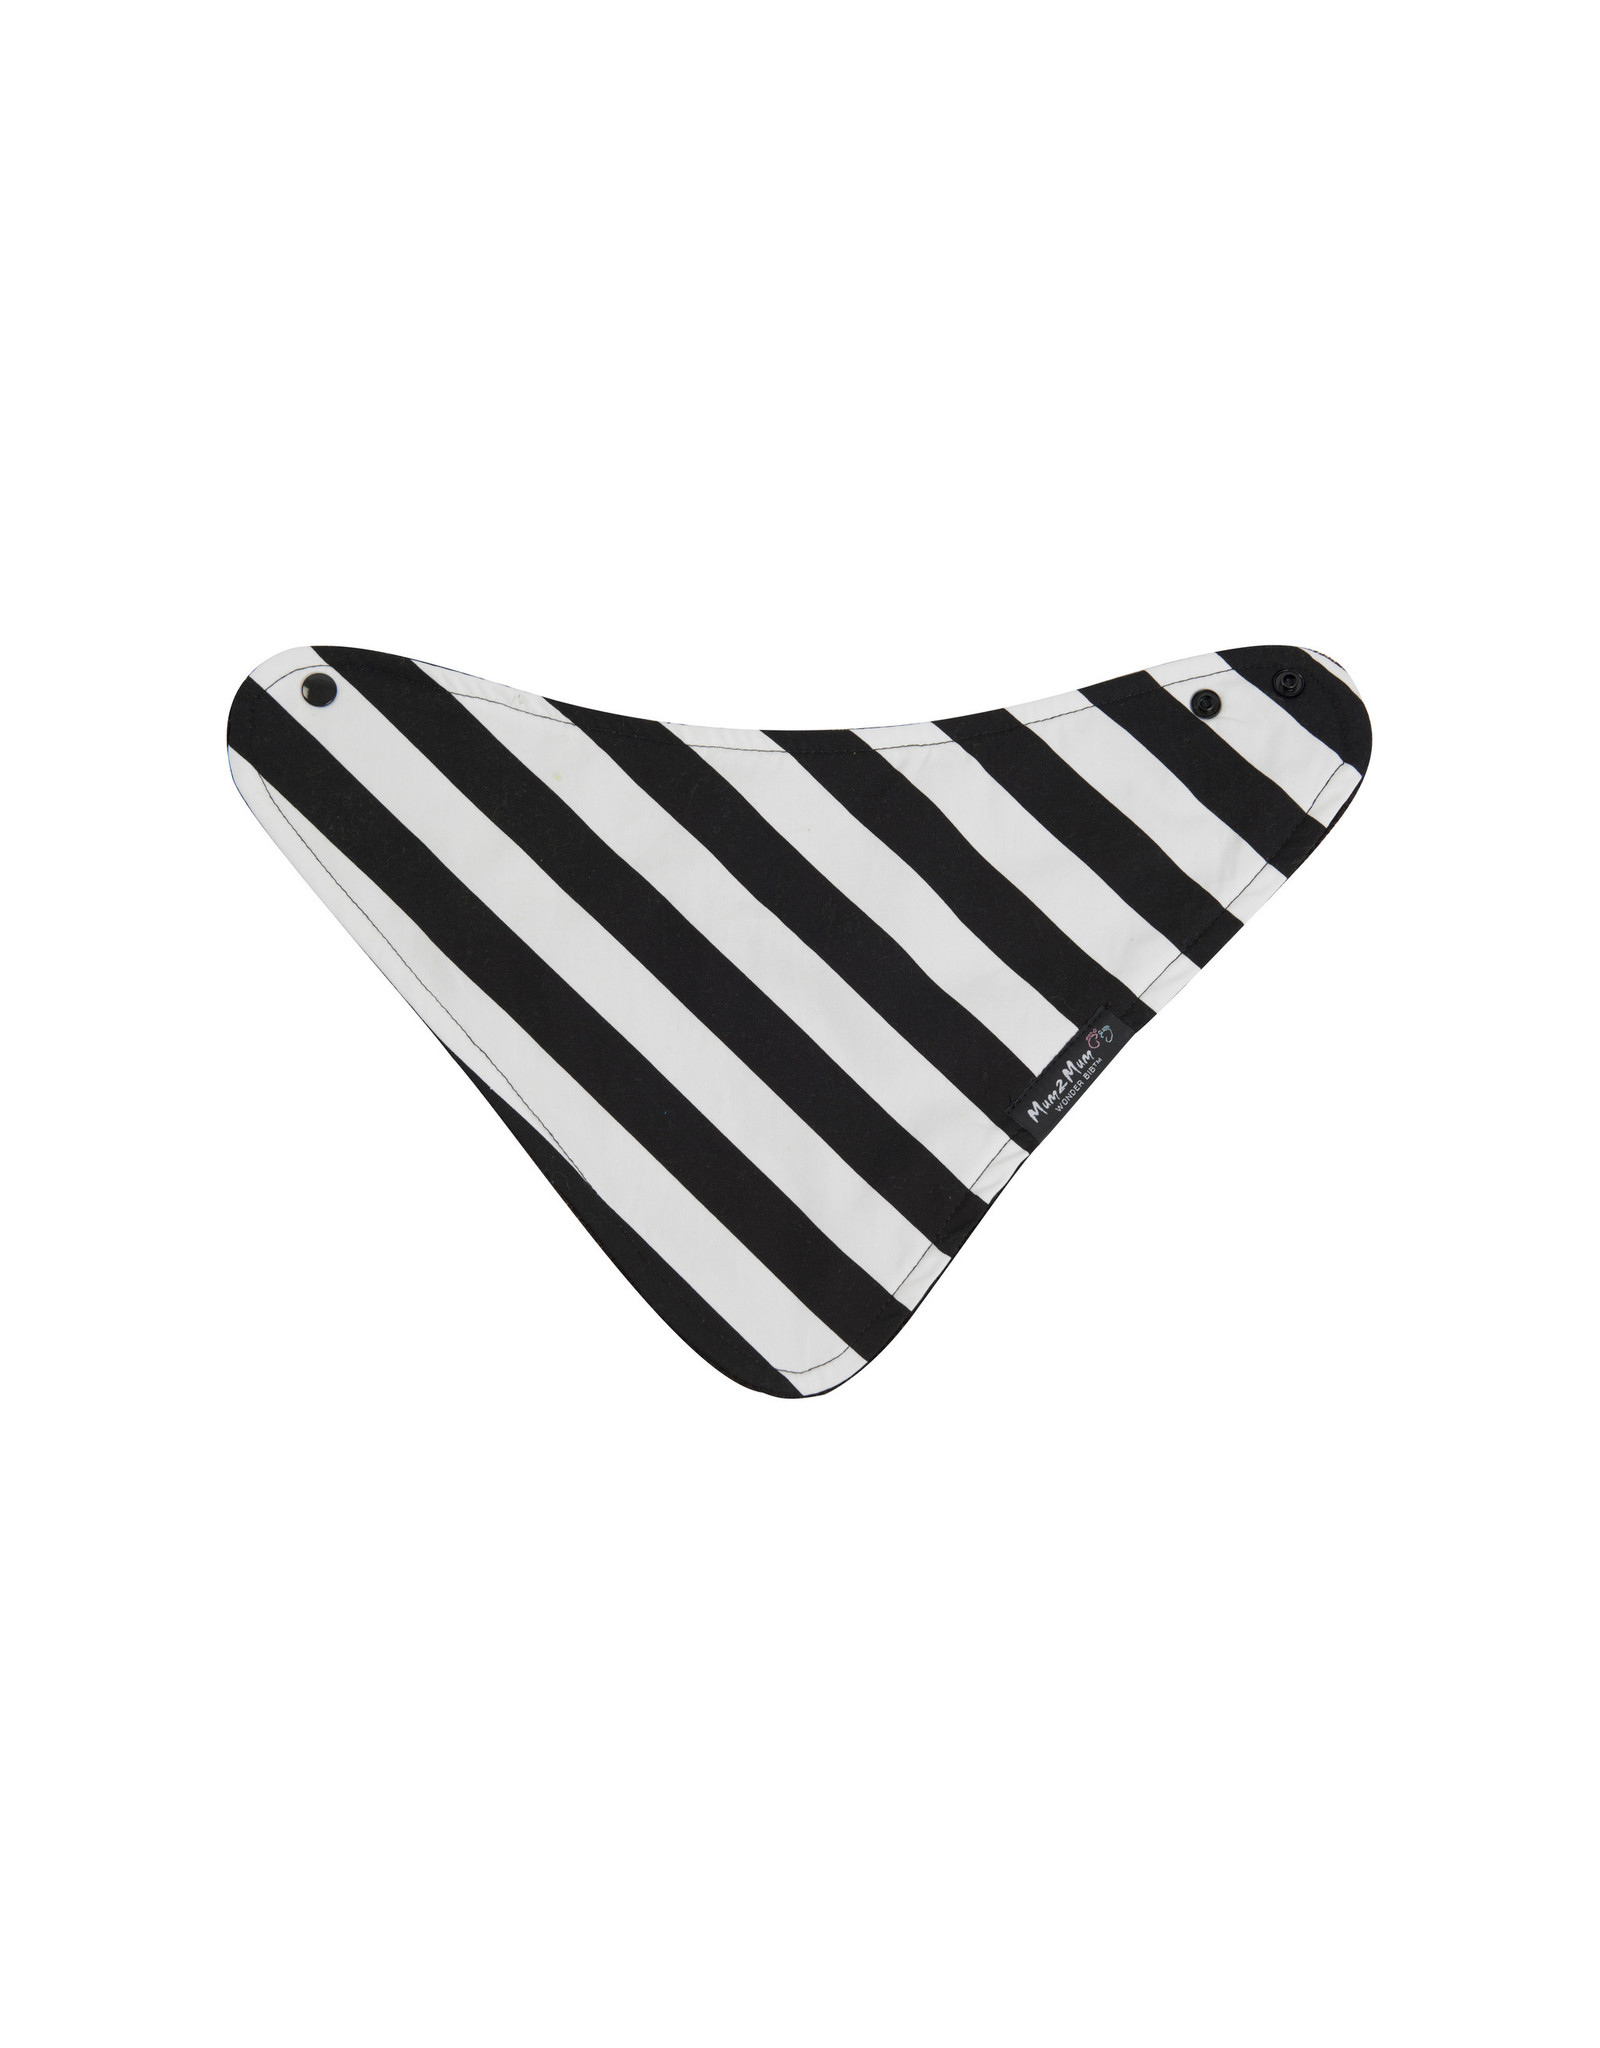 Mum2Mum Mum2Mum Fashion Bib B&W Stripes 6 pieces